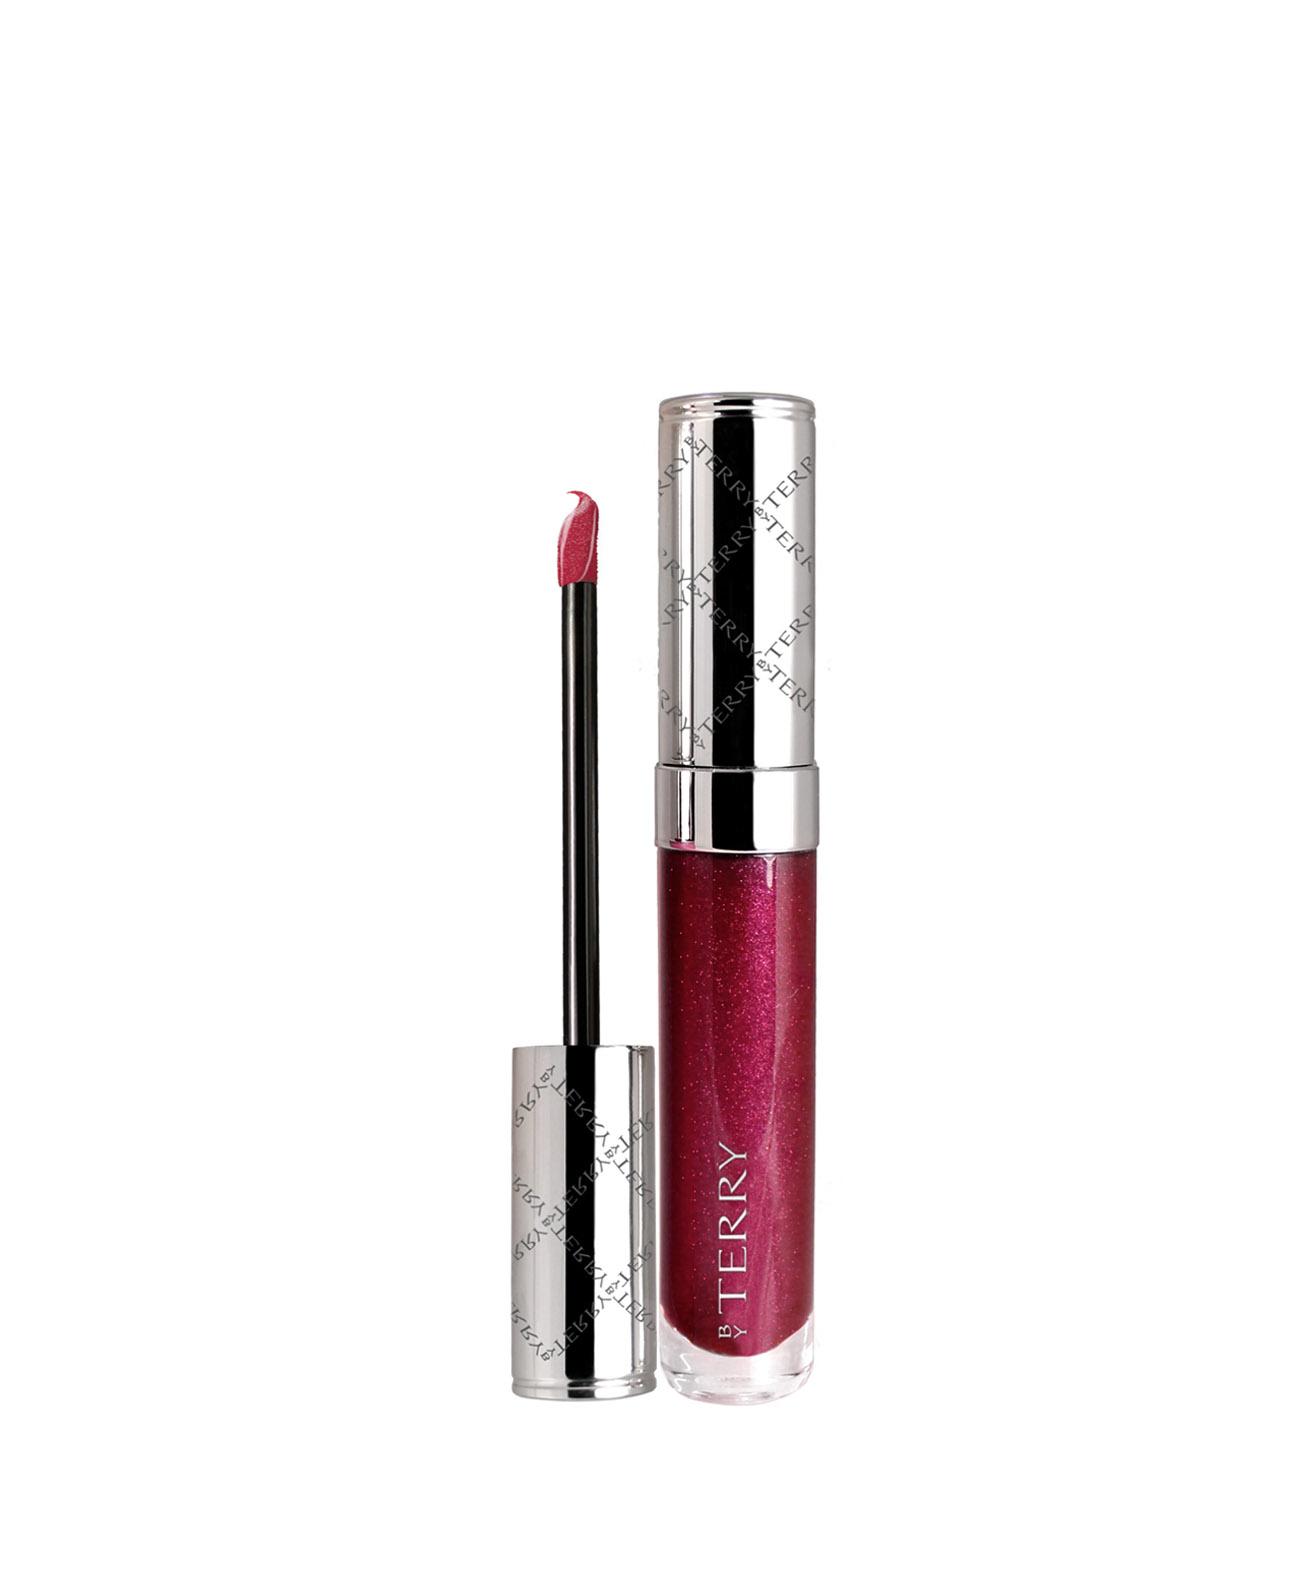 1-Gloss-Terrybly-Shine-lucidalabbra-idratante-liftante-Linea-makeup-di-nicchia-By-Terry-Dispar-SpA.jpg